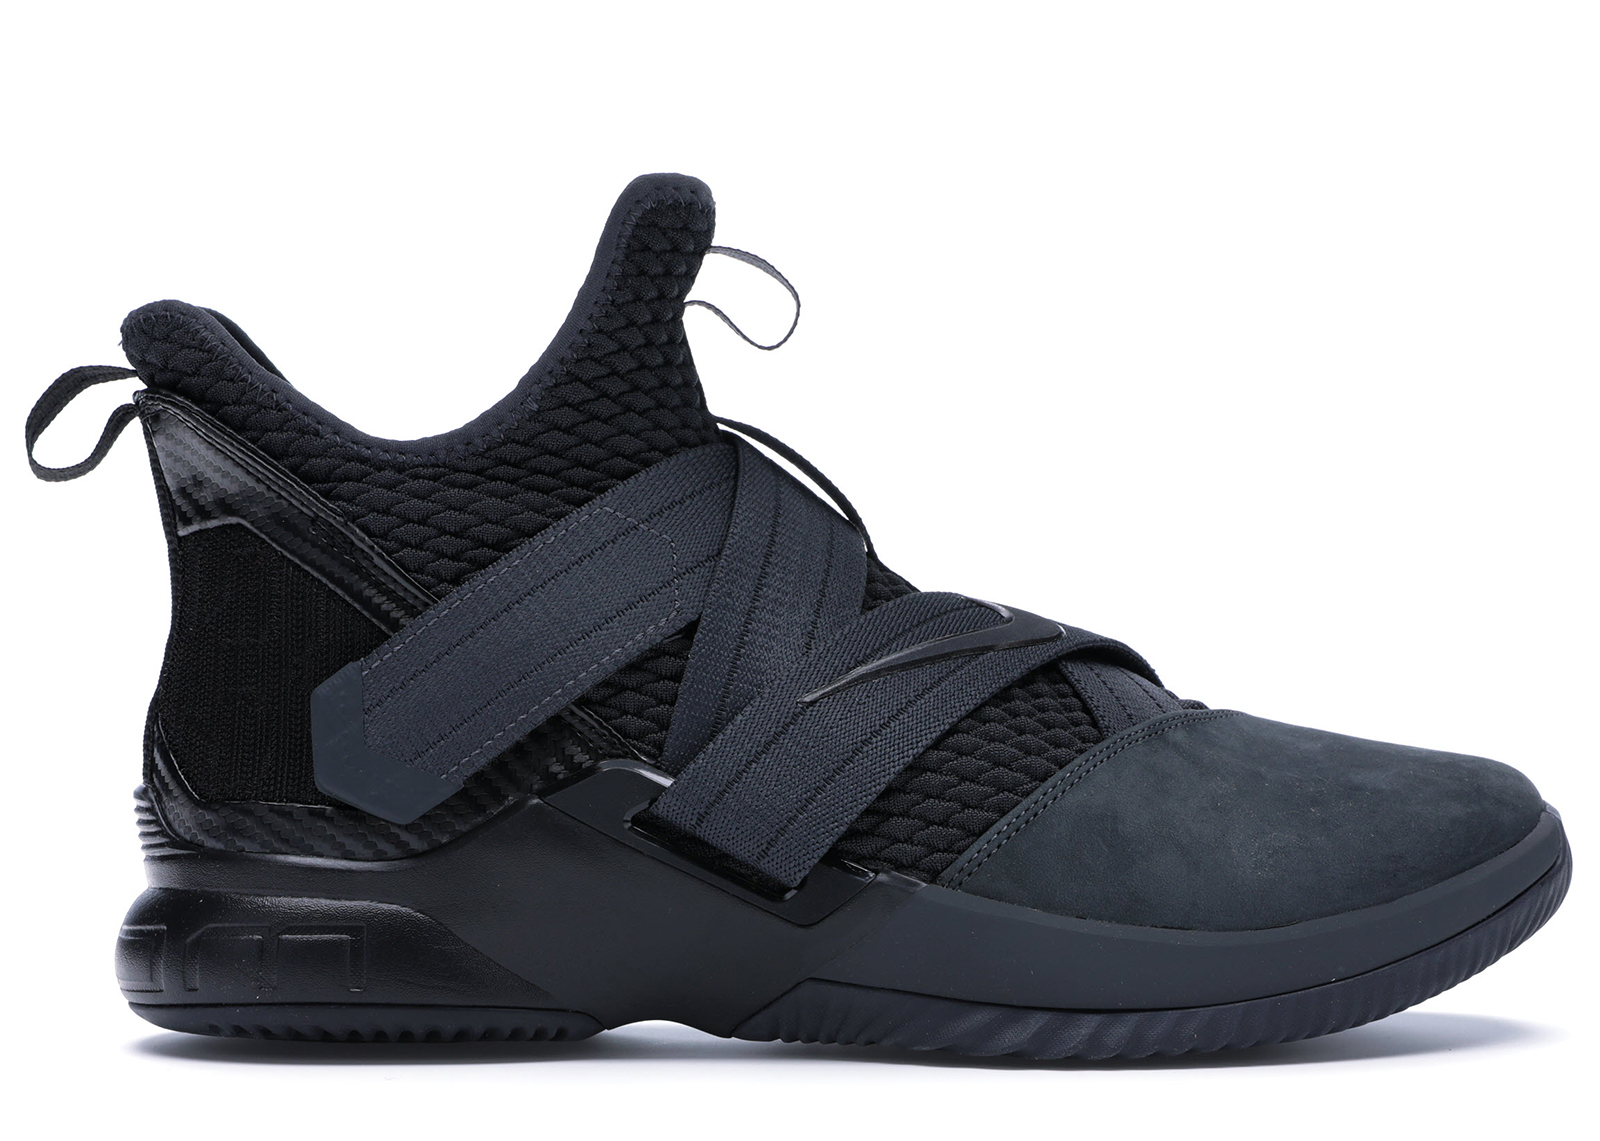 Nike LeBron Zoom Soldier 12 Dark 23